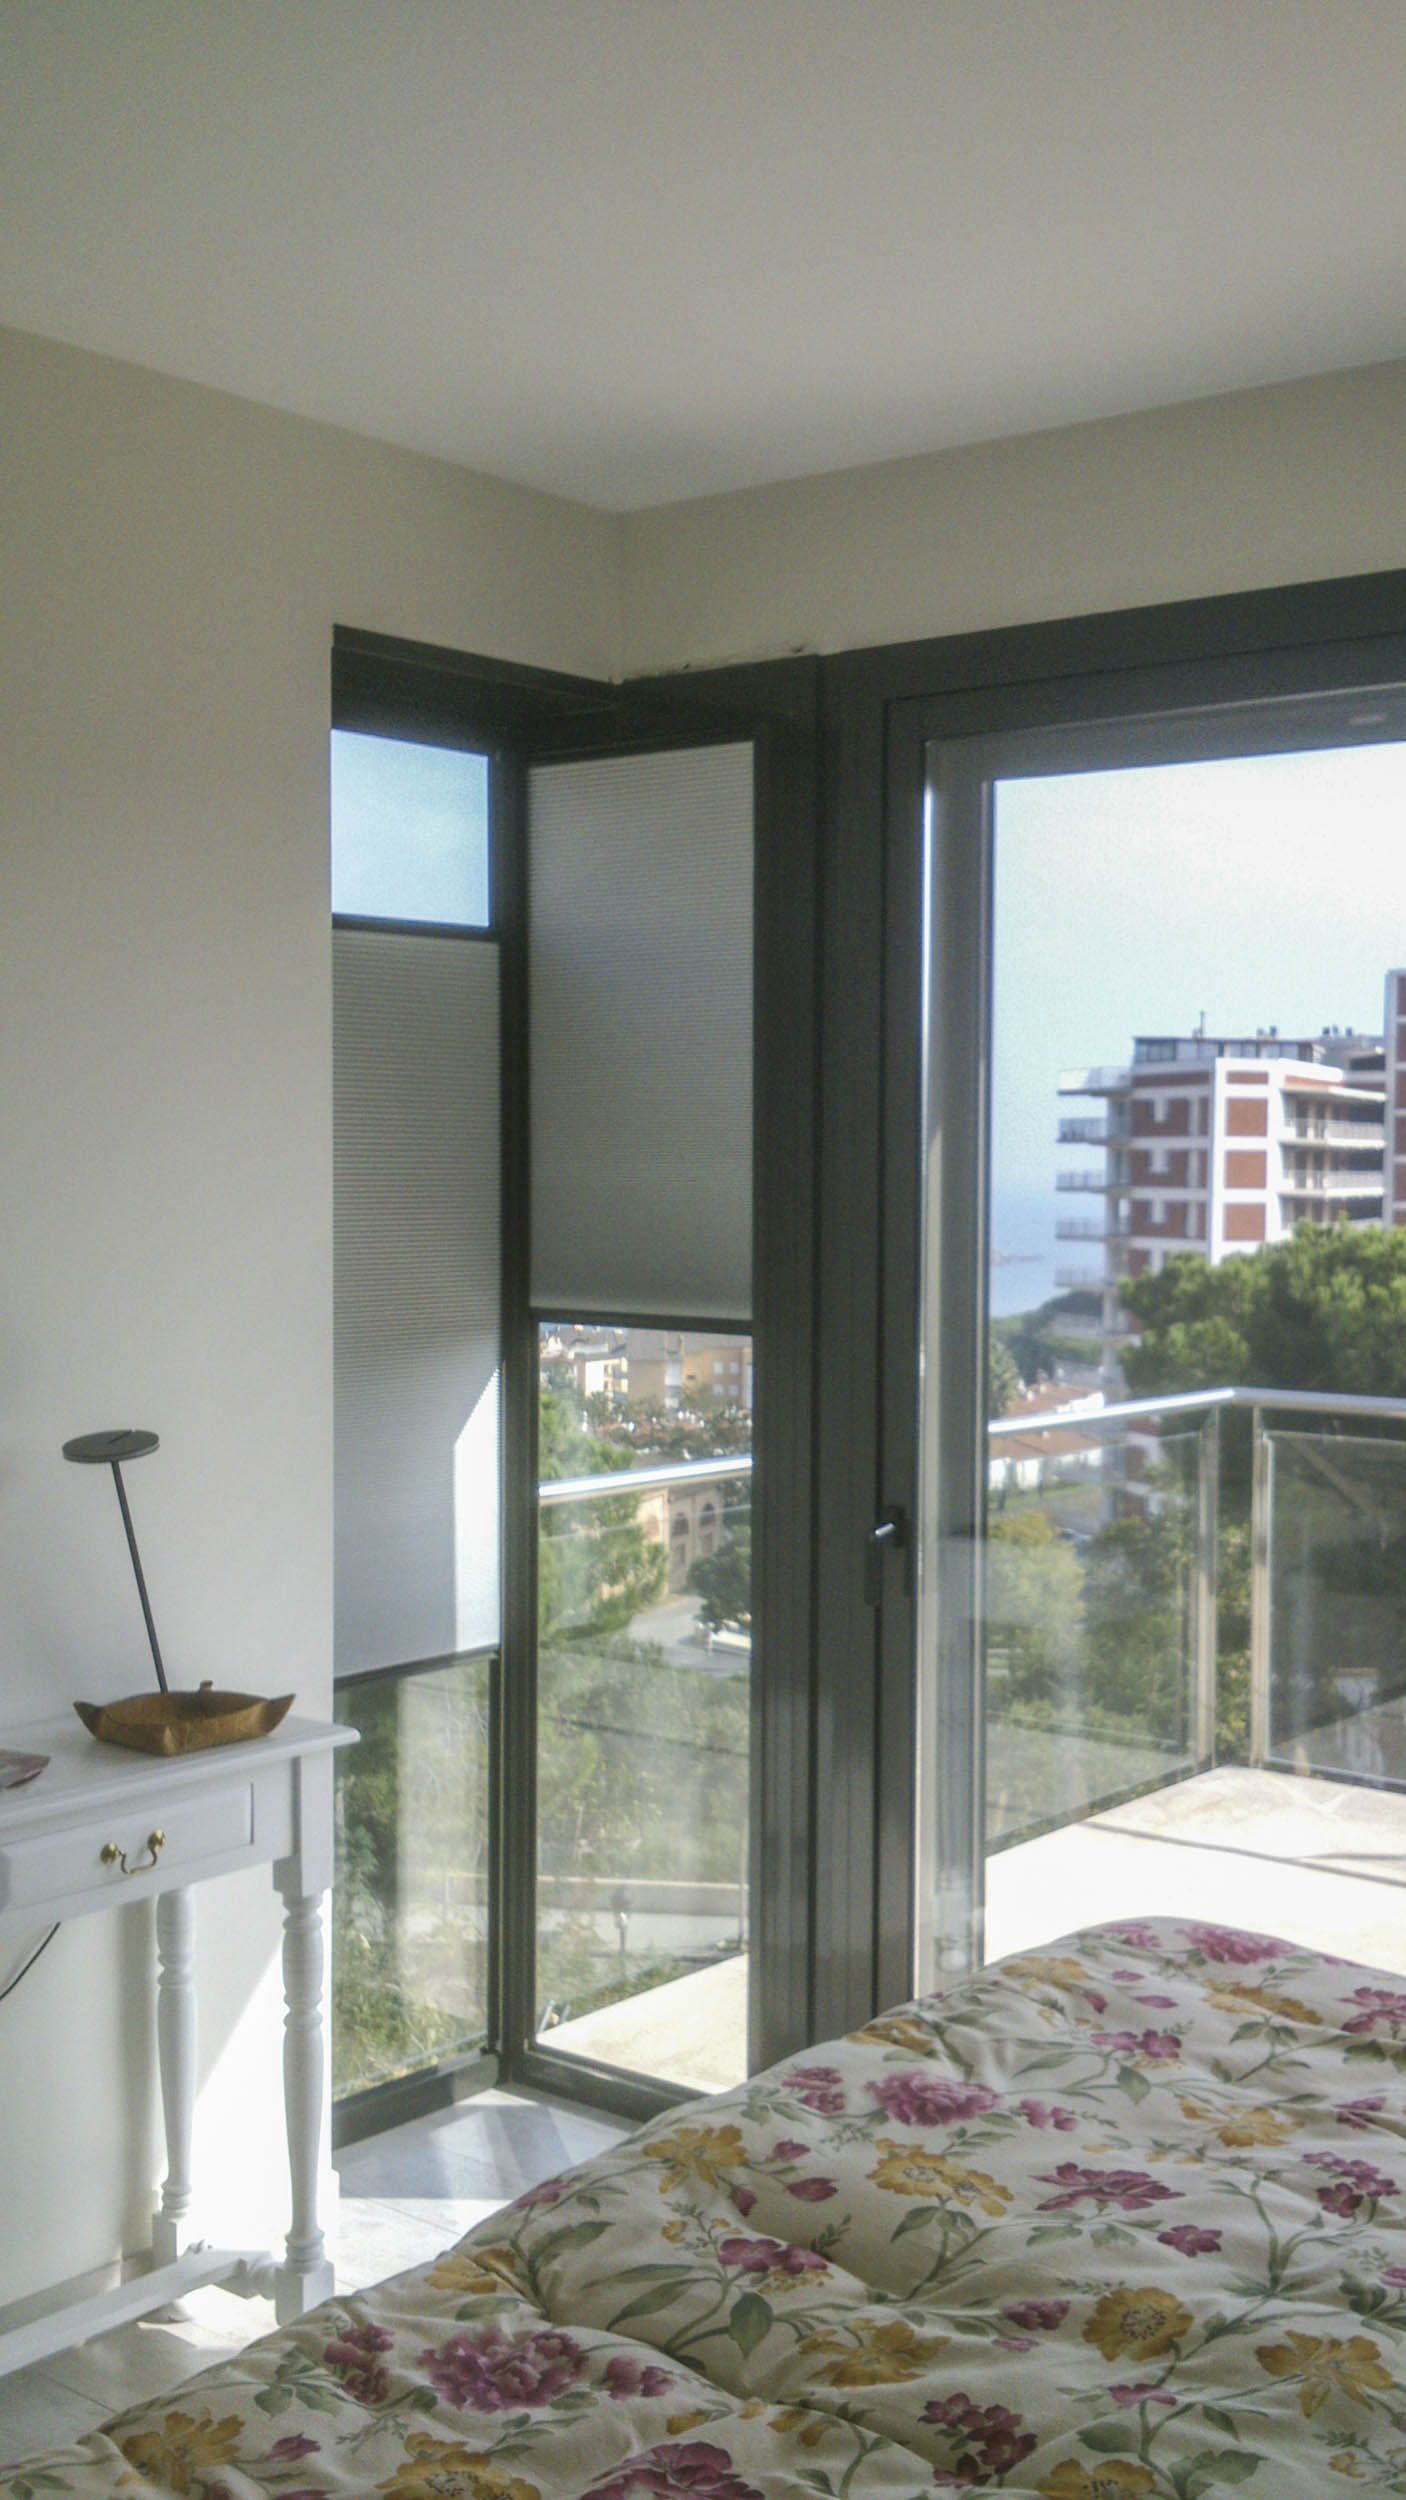 Cortina cortinas interiores pinterest